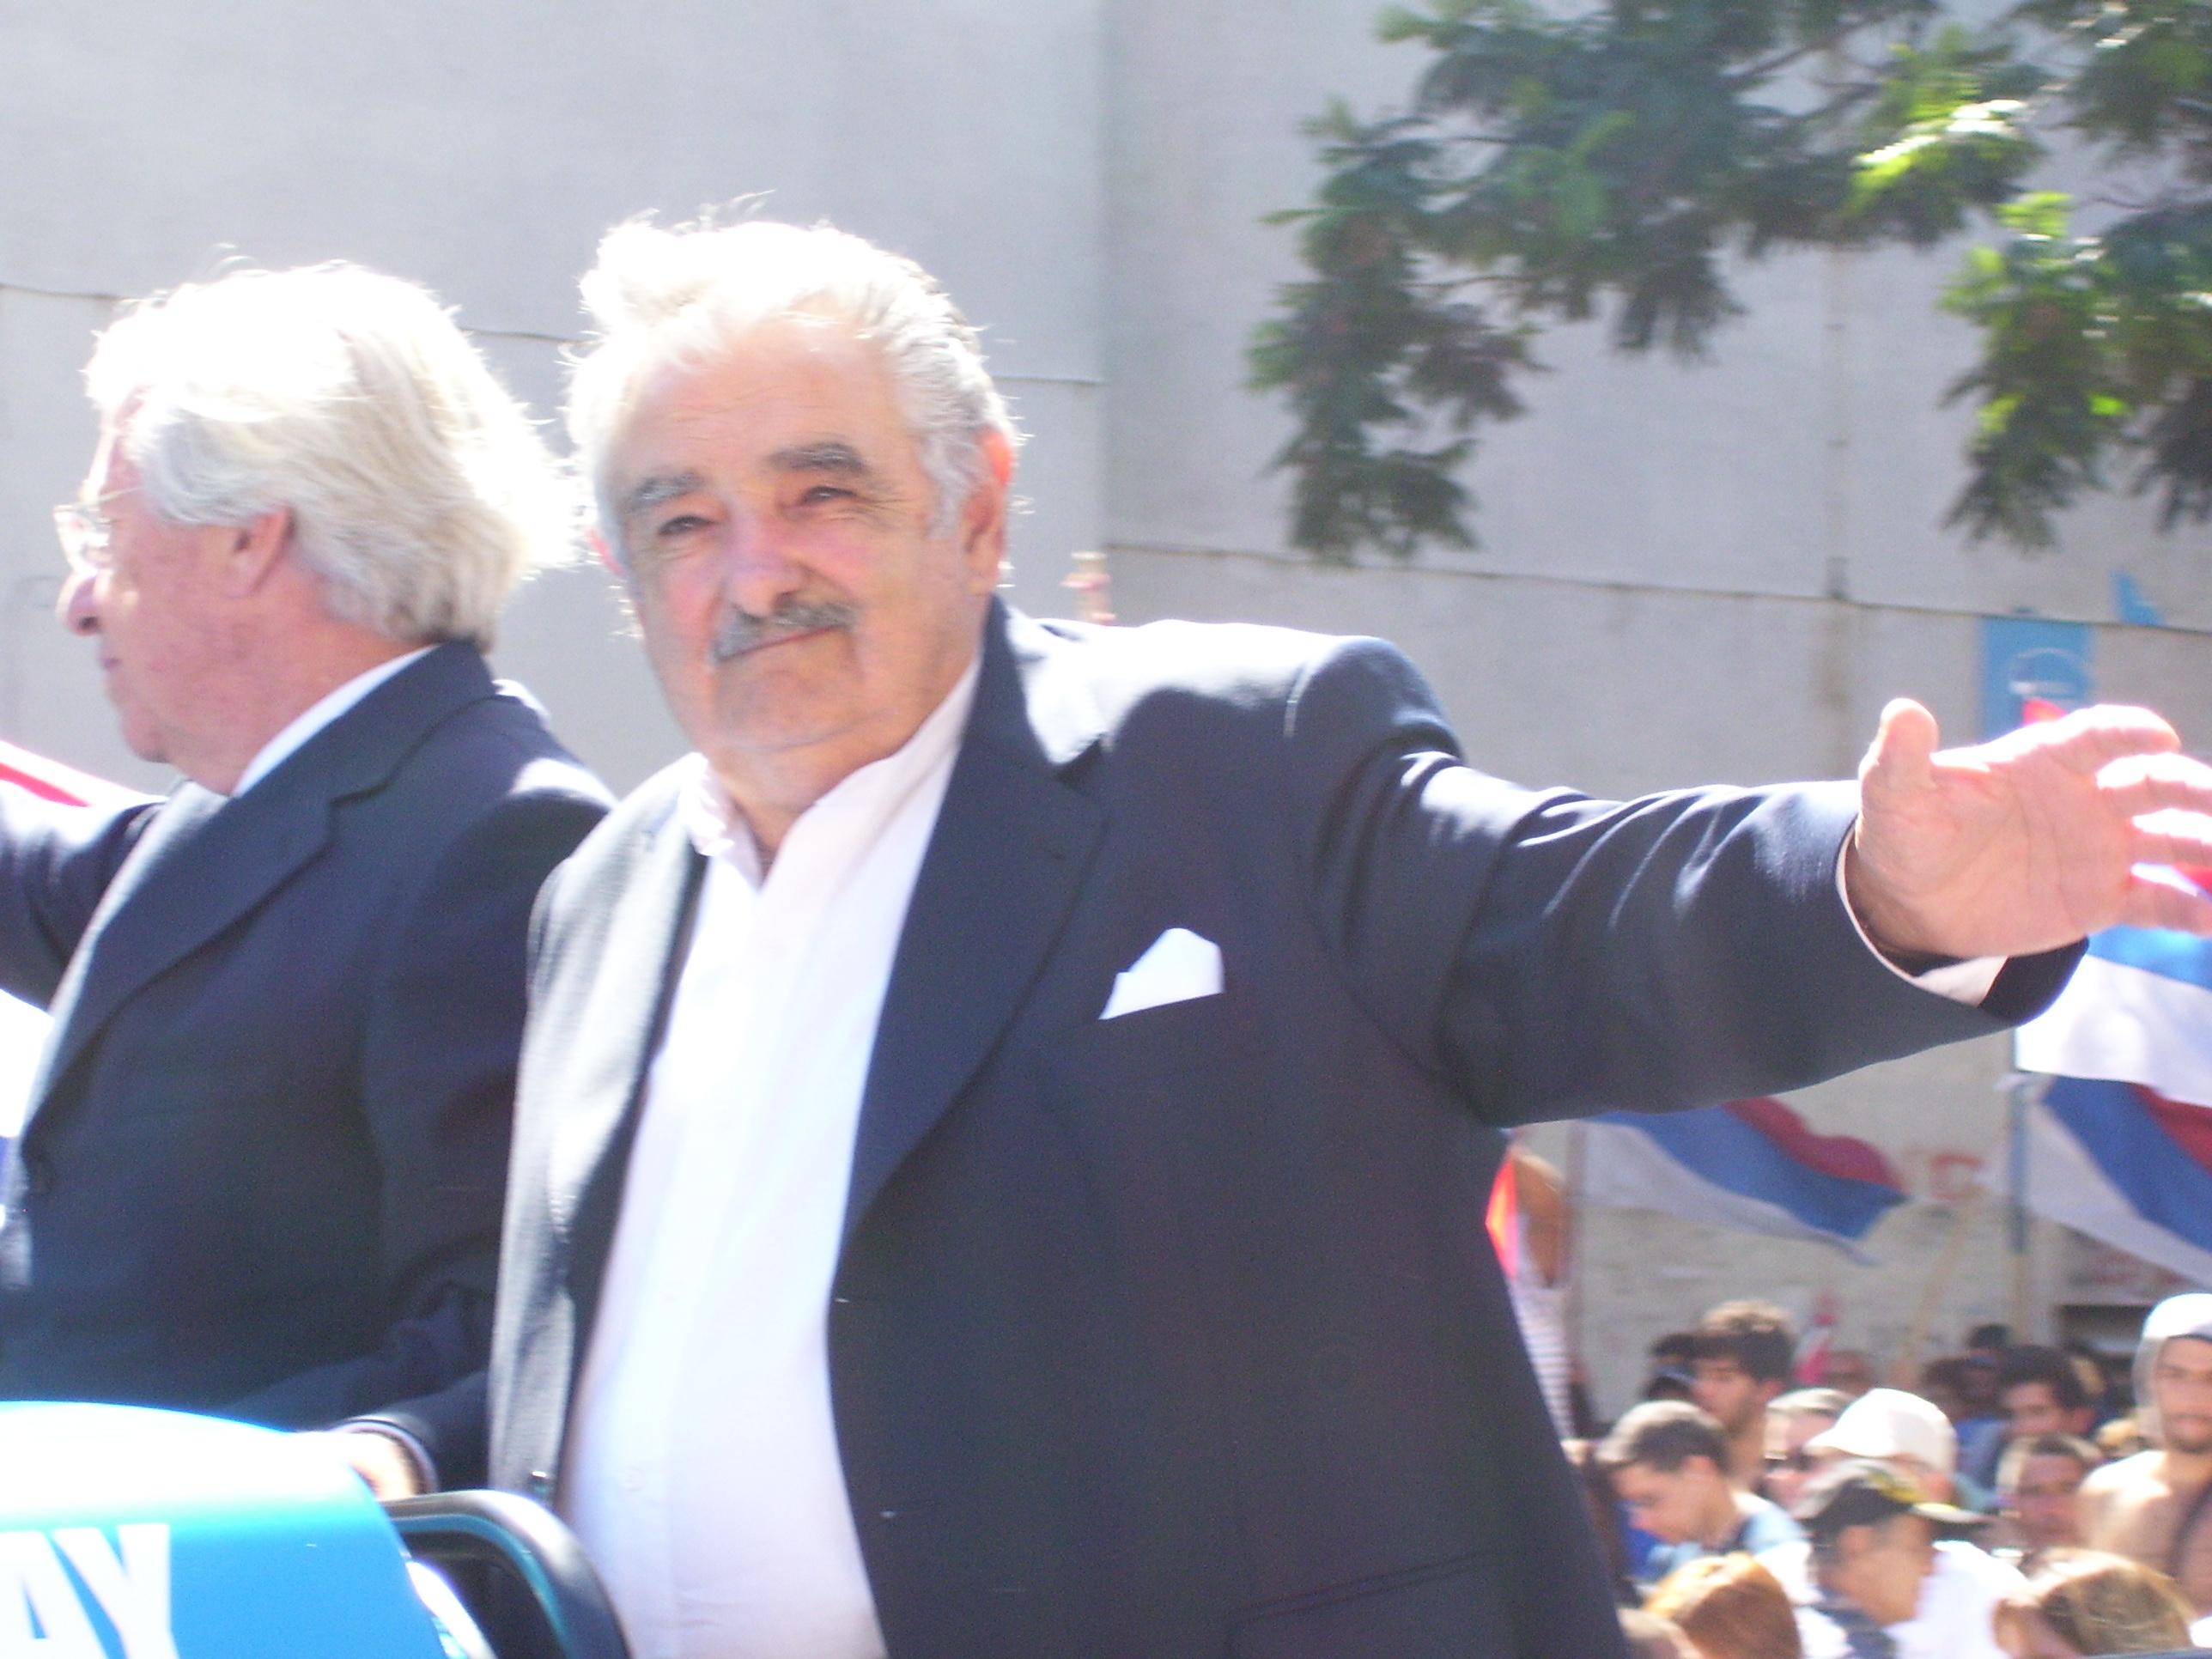 http://upload.wikimedia.org/wikipedia/commons/6/66/Presidente_Mujica_Saludando_2010.jpg